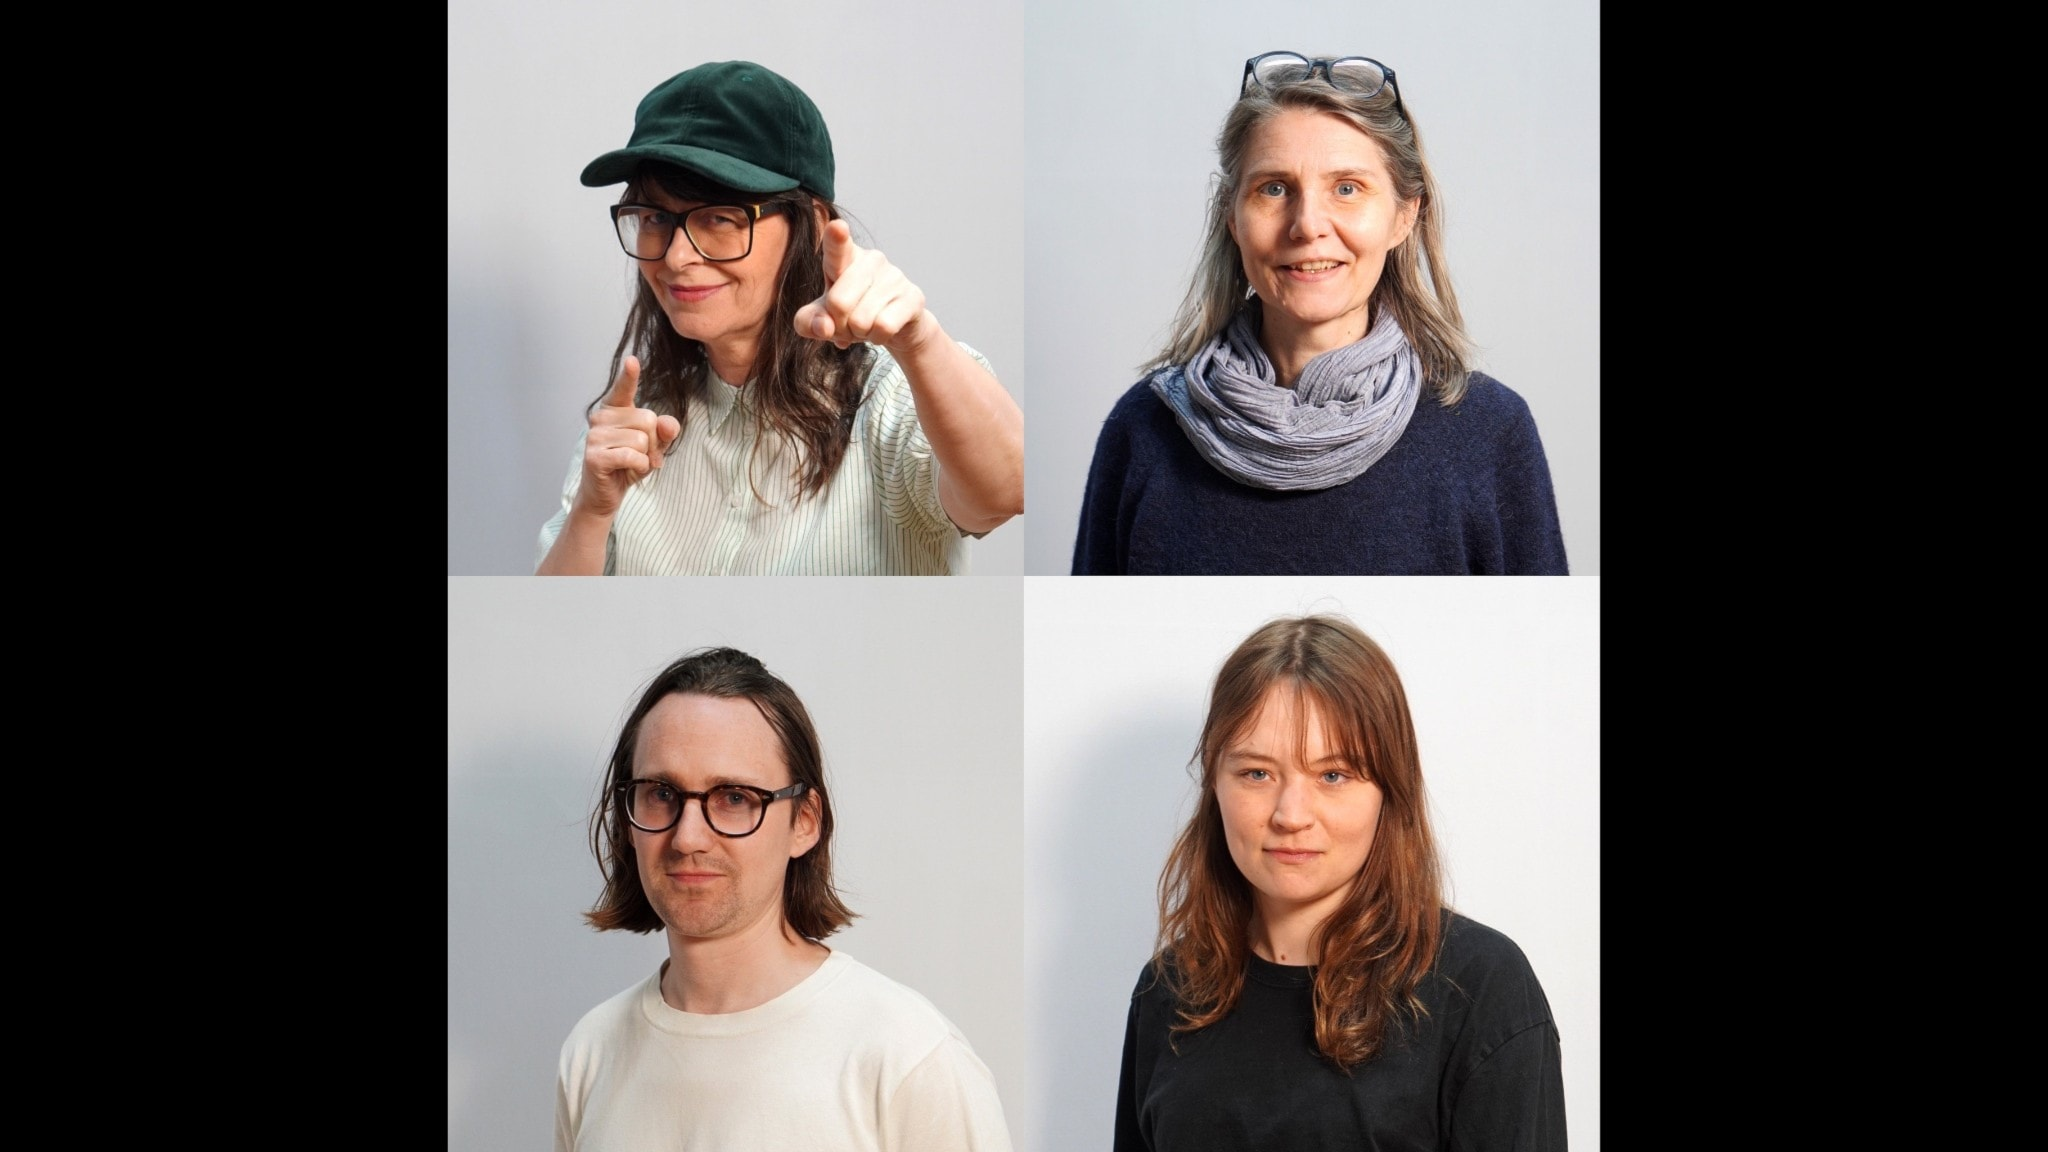 Anna-Charlotta Gunnarsson, Agneta Karlsson, Carl-Johan Ulvenäs & Hanna Frelin